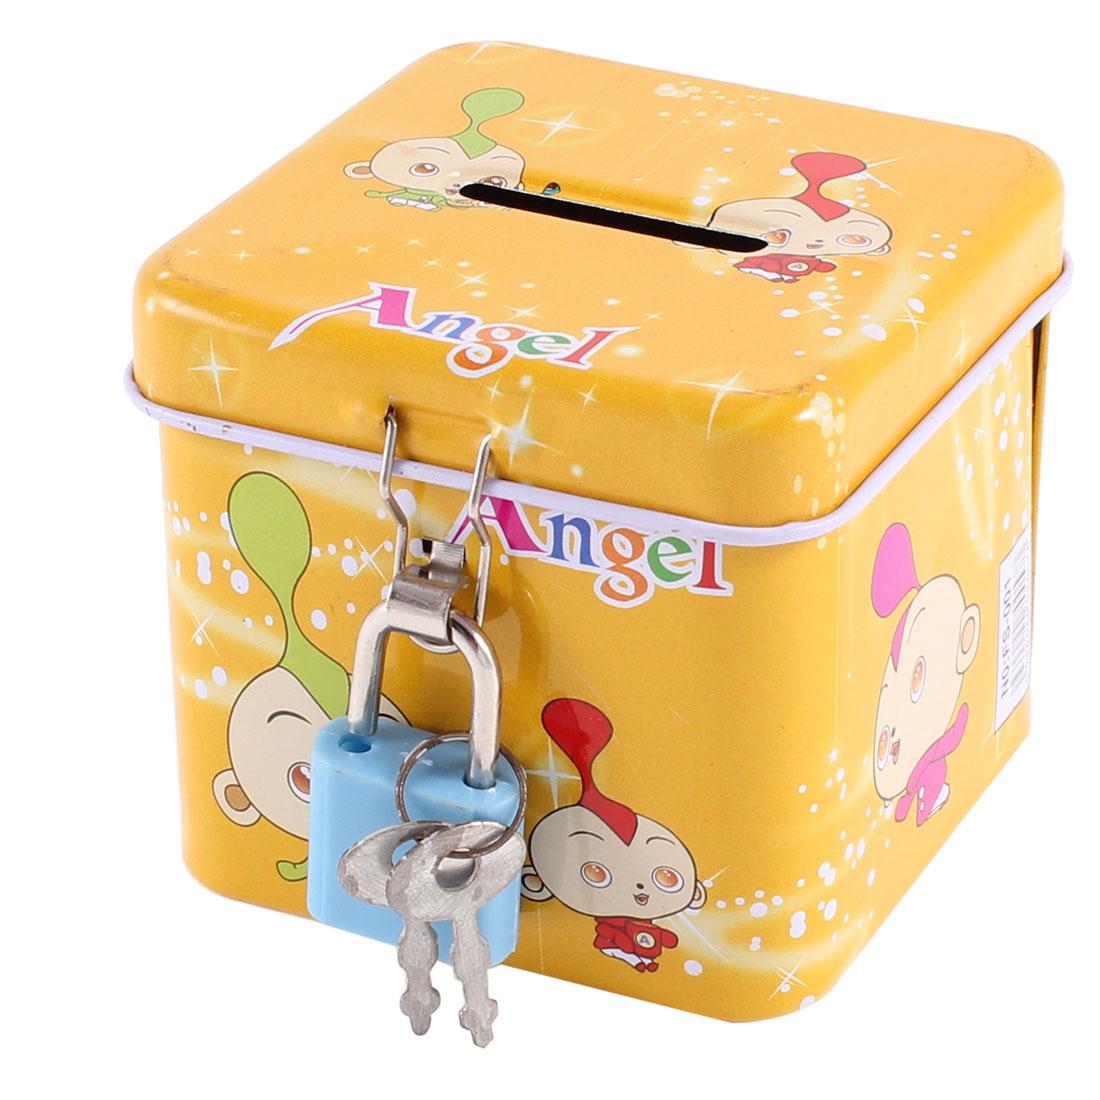 Cartoon Kid Pattern Metal Lockable Piggy Bank Coin Money Saving Box Yellow